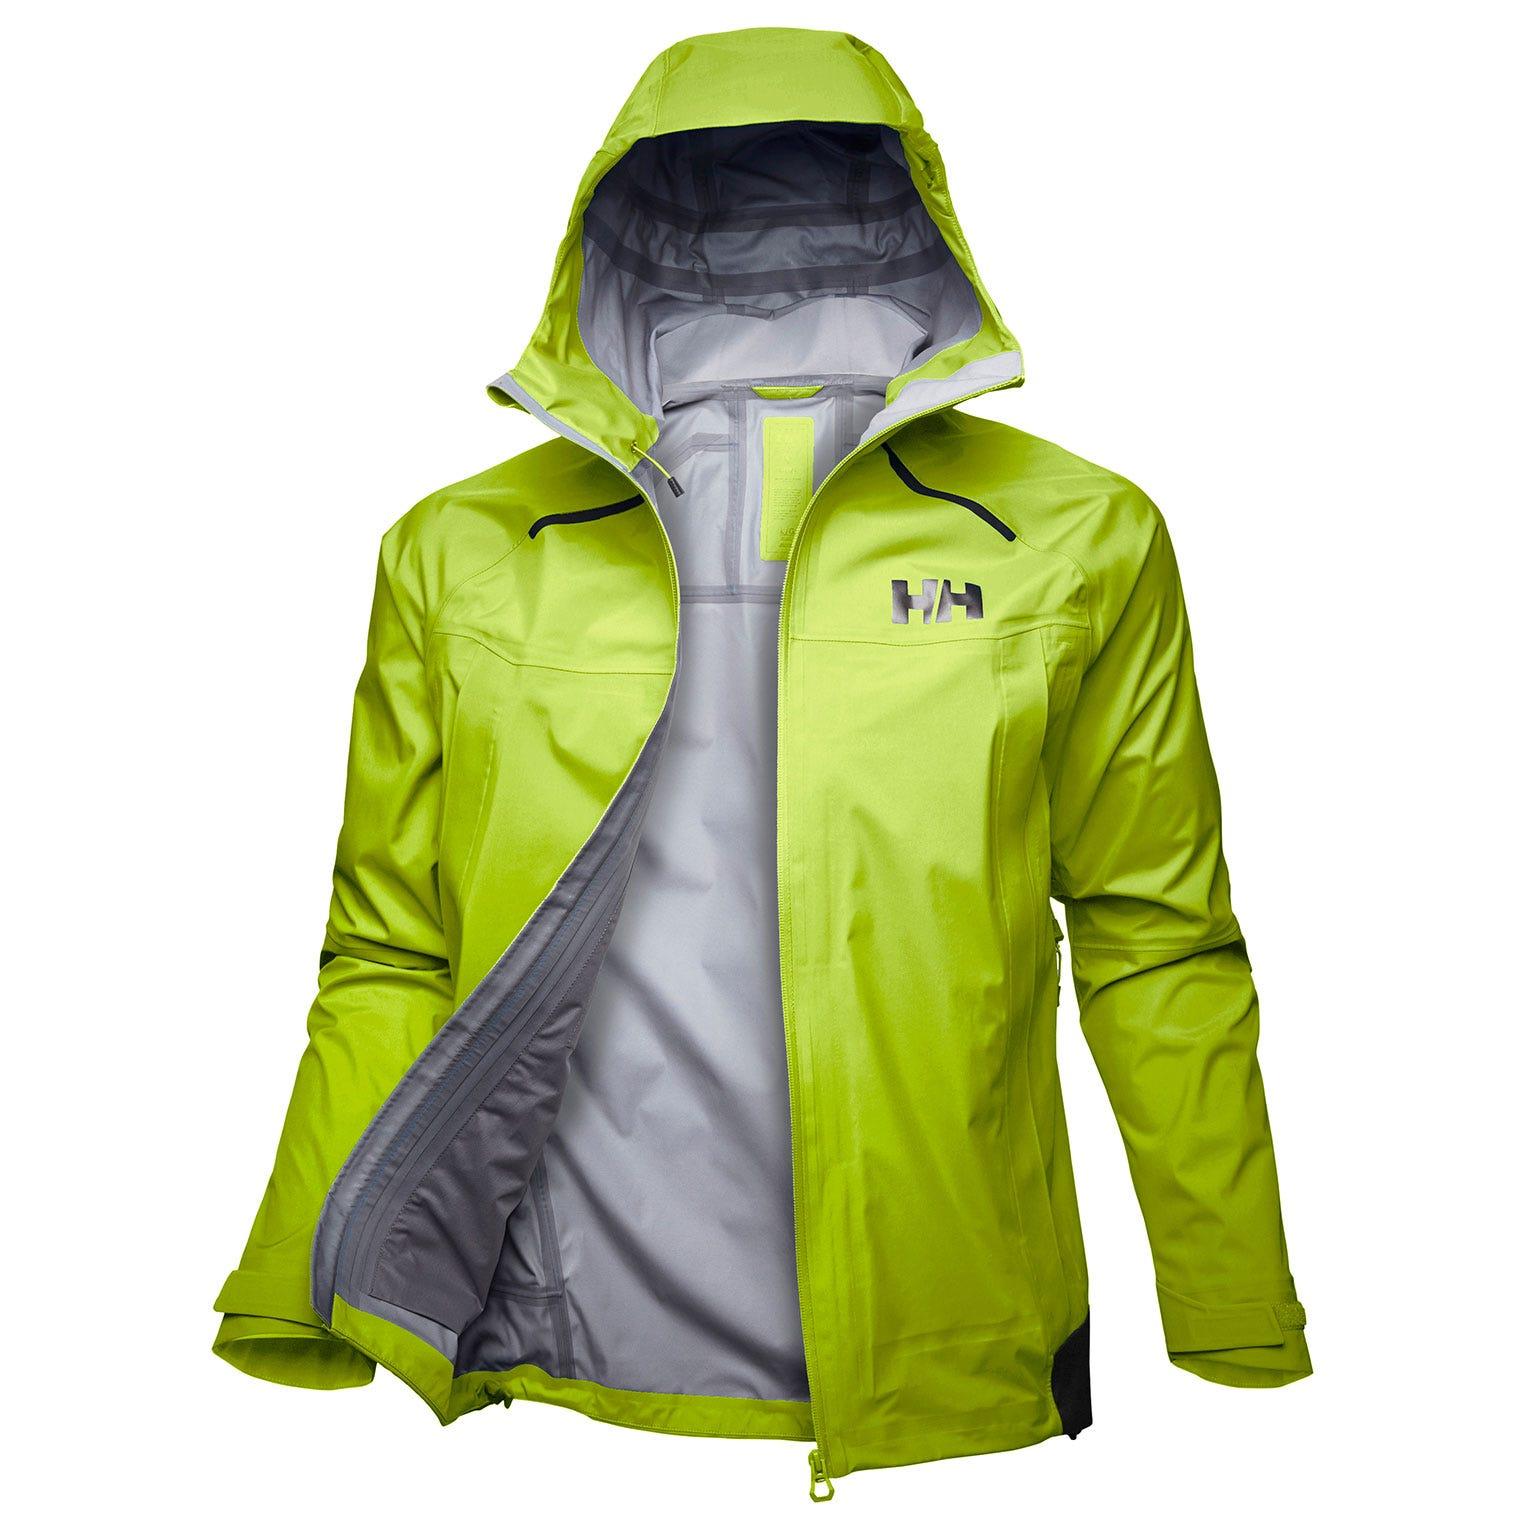 Helly Hansen Odin 9 Worlds Jacket Mens Hiking Yellow M